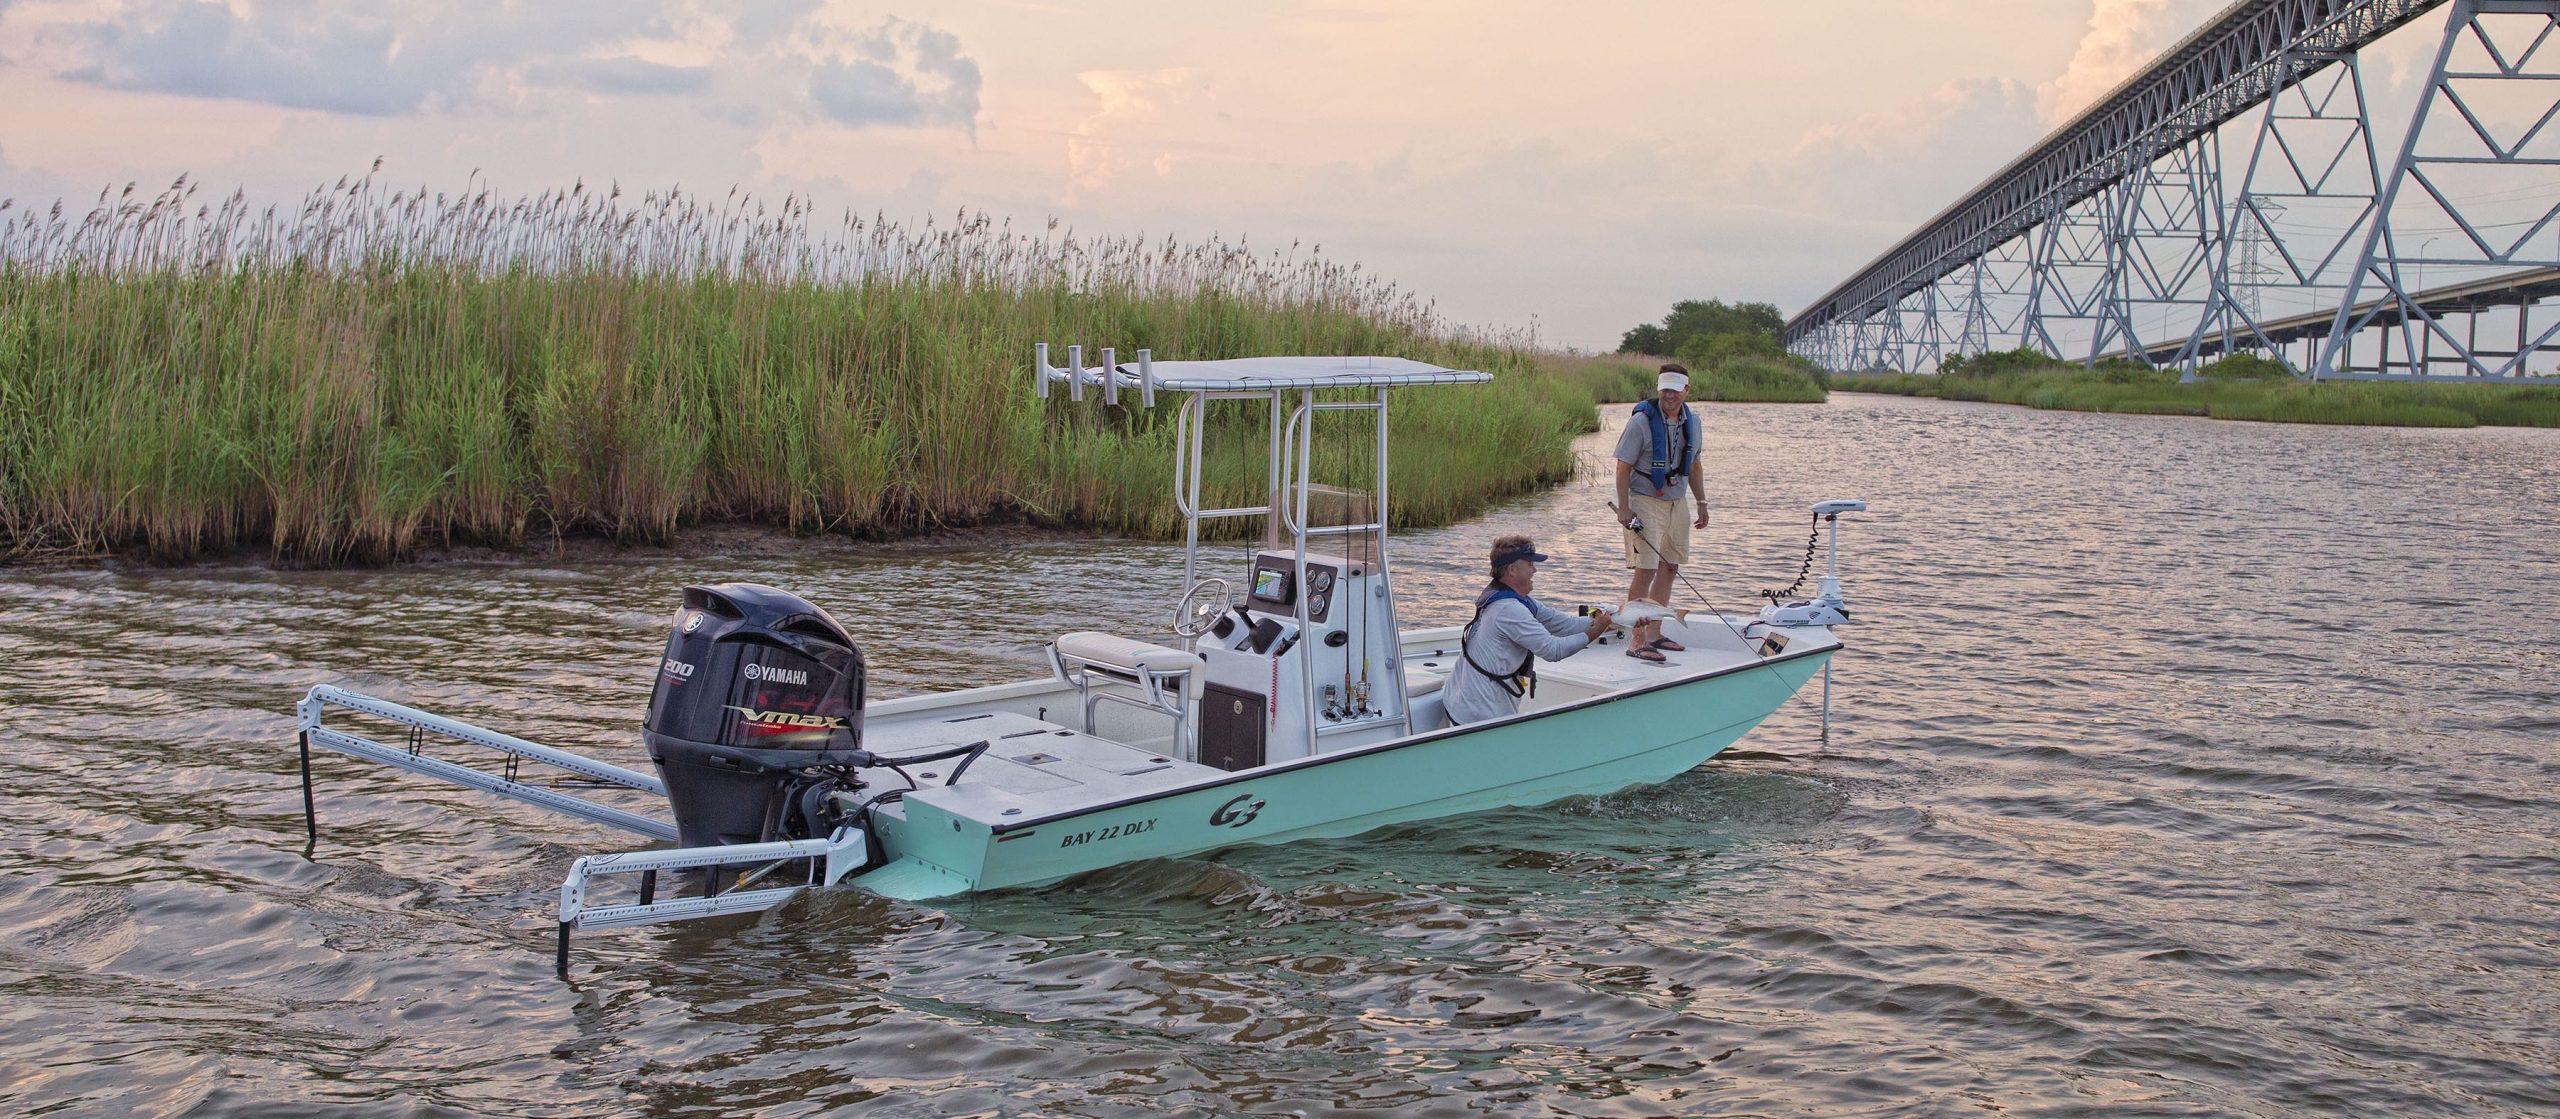 Bay Series G3 Boat